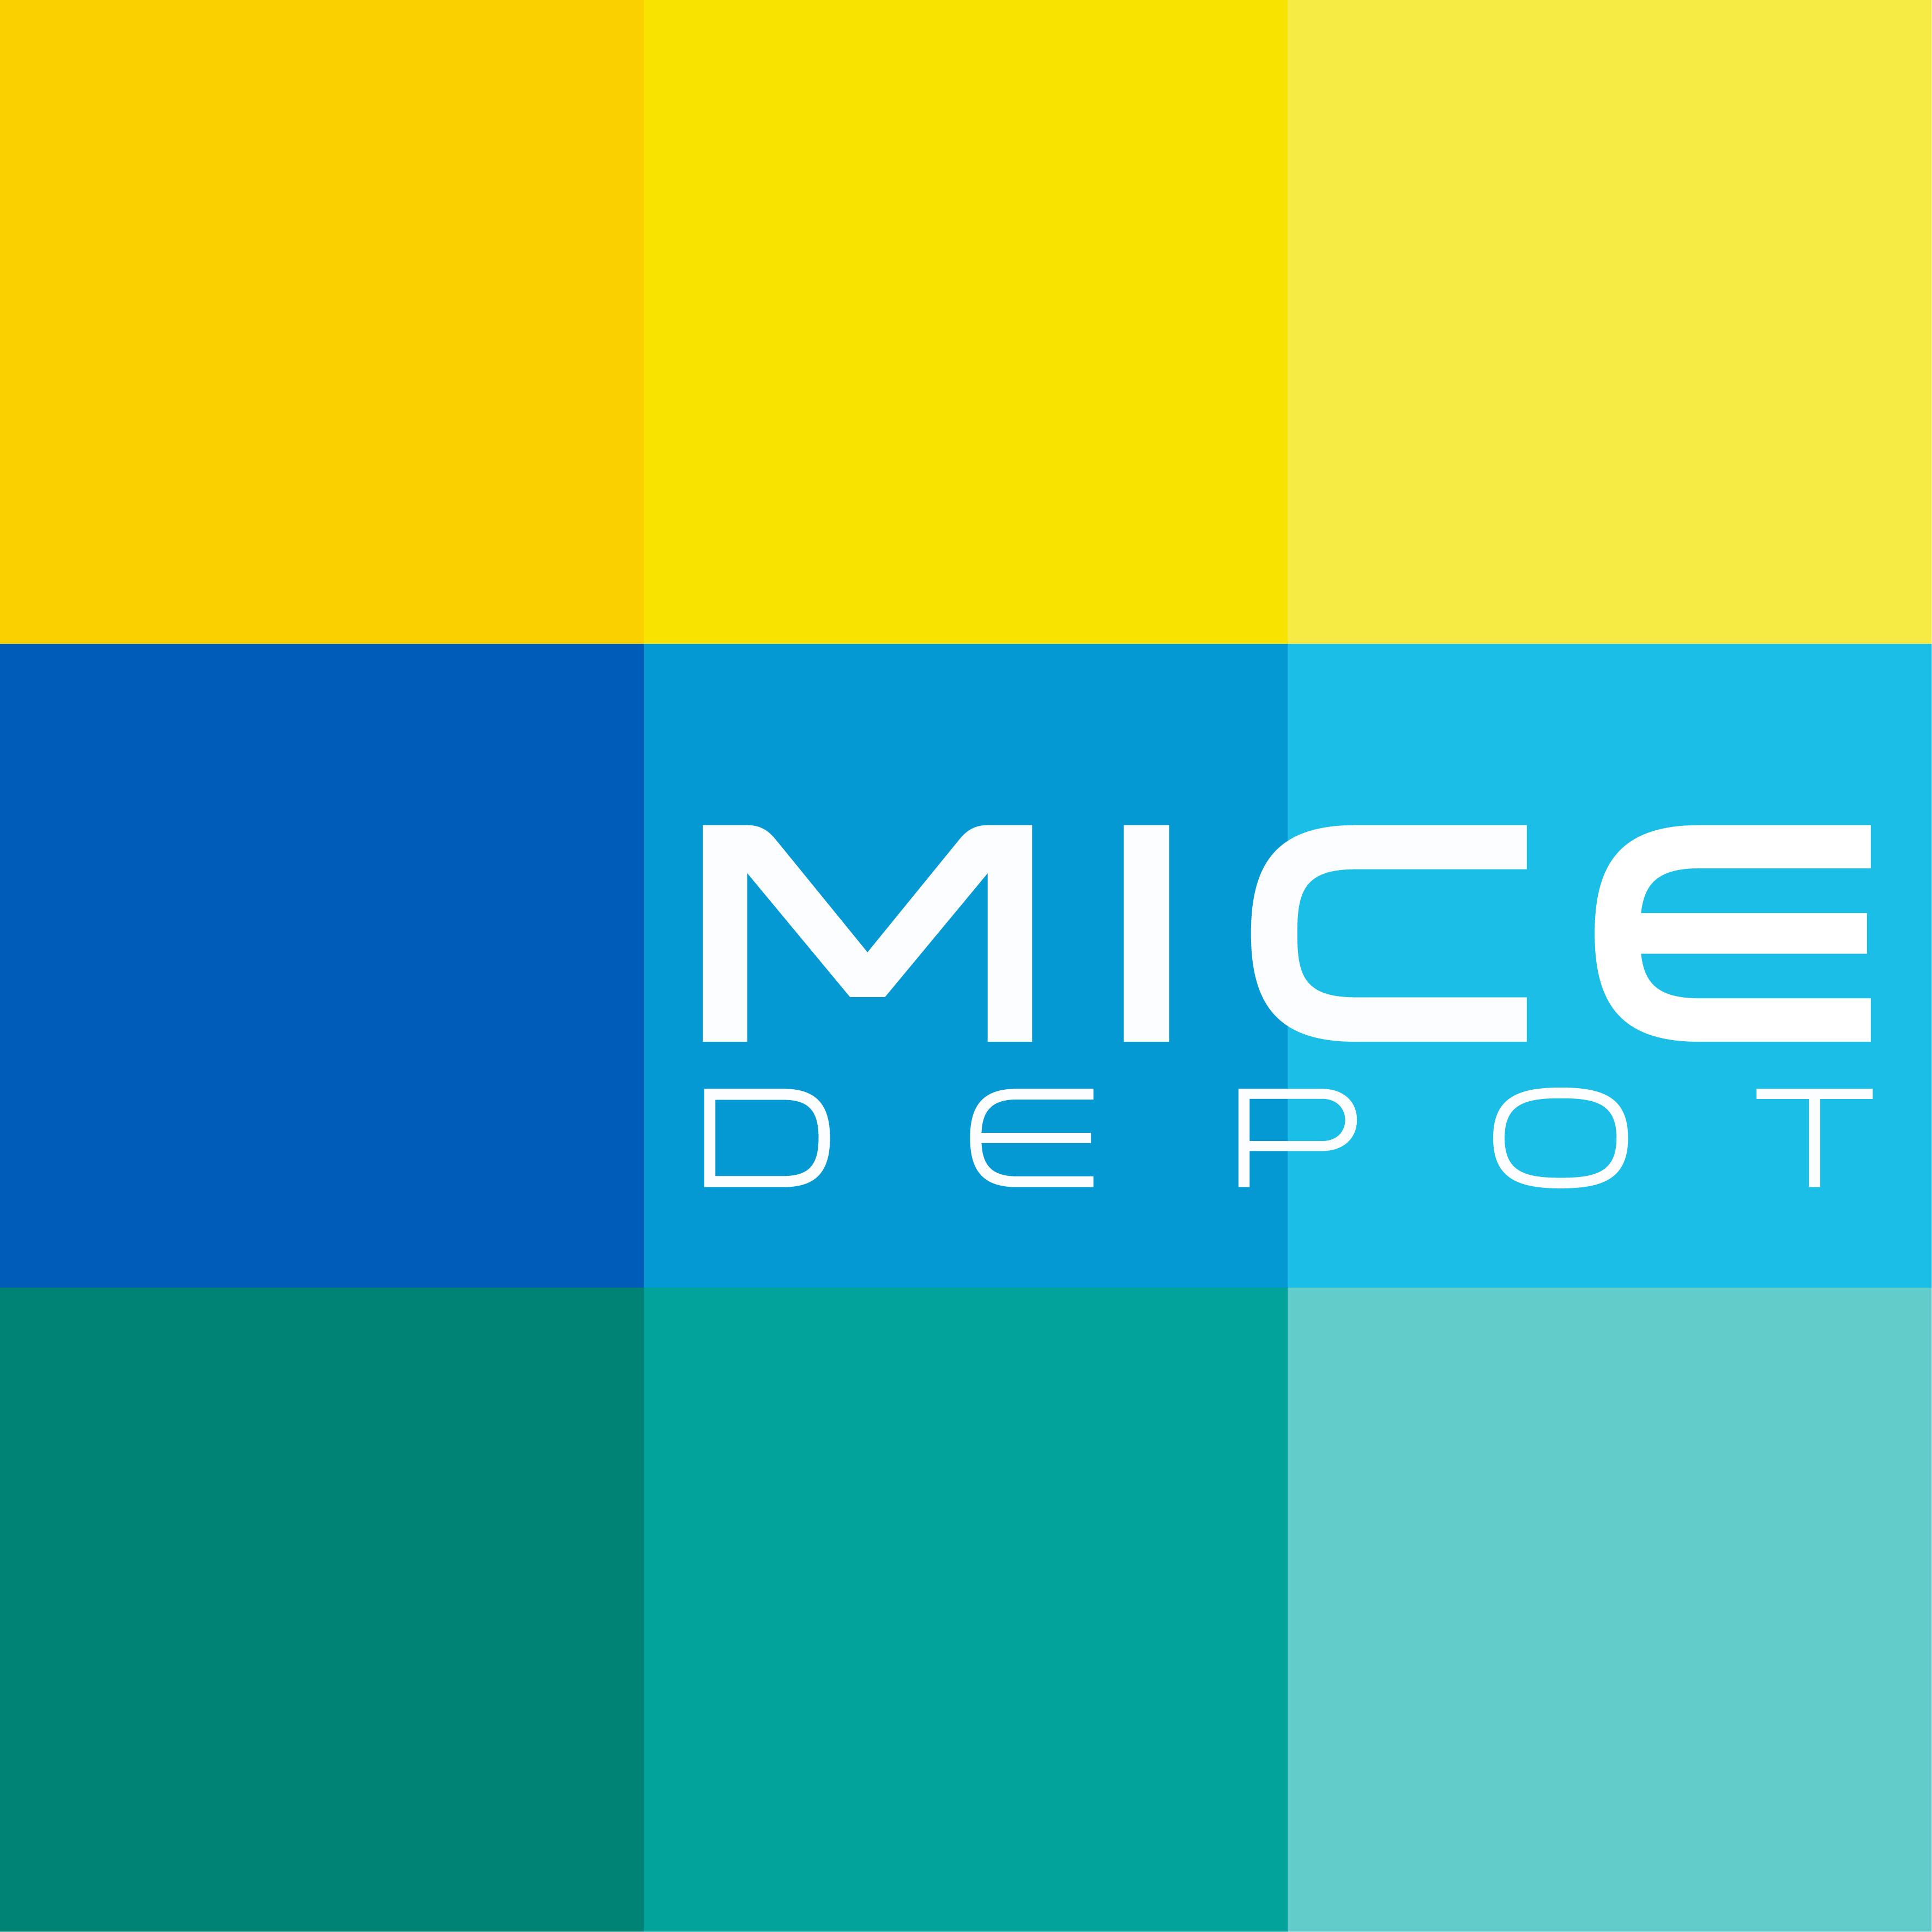 mice depot